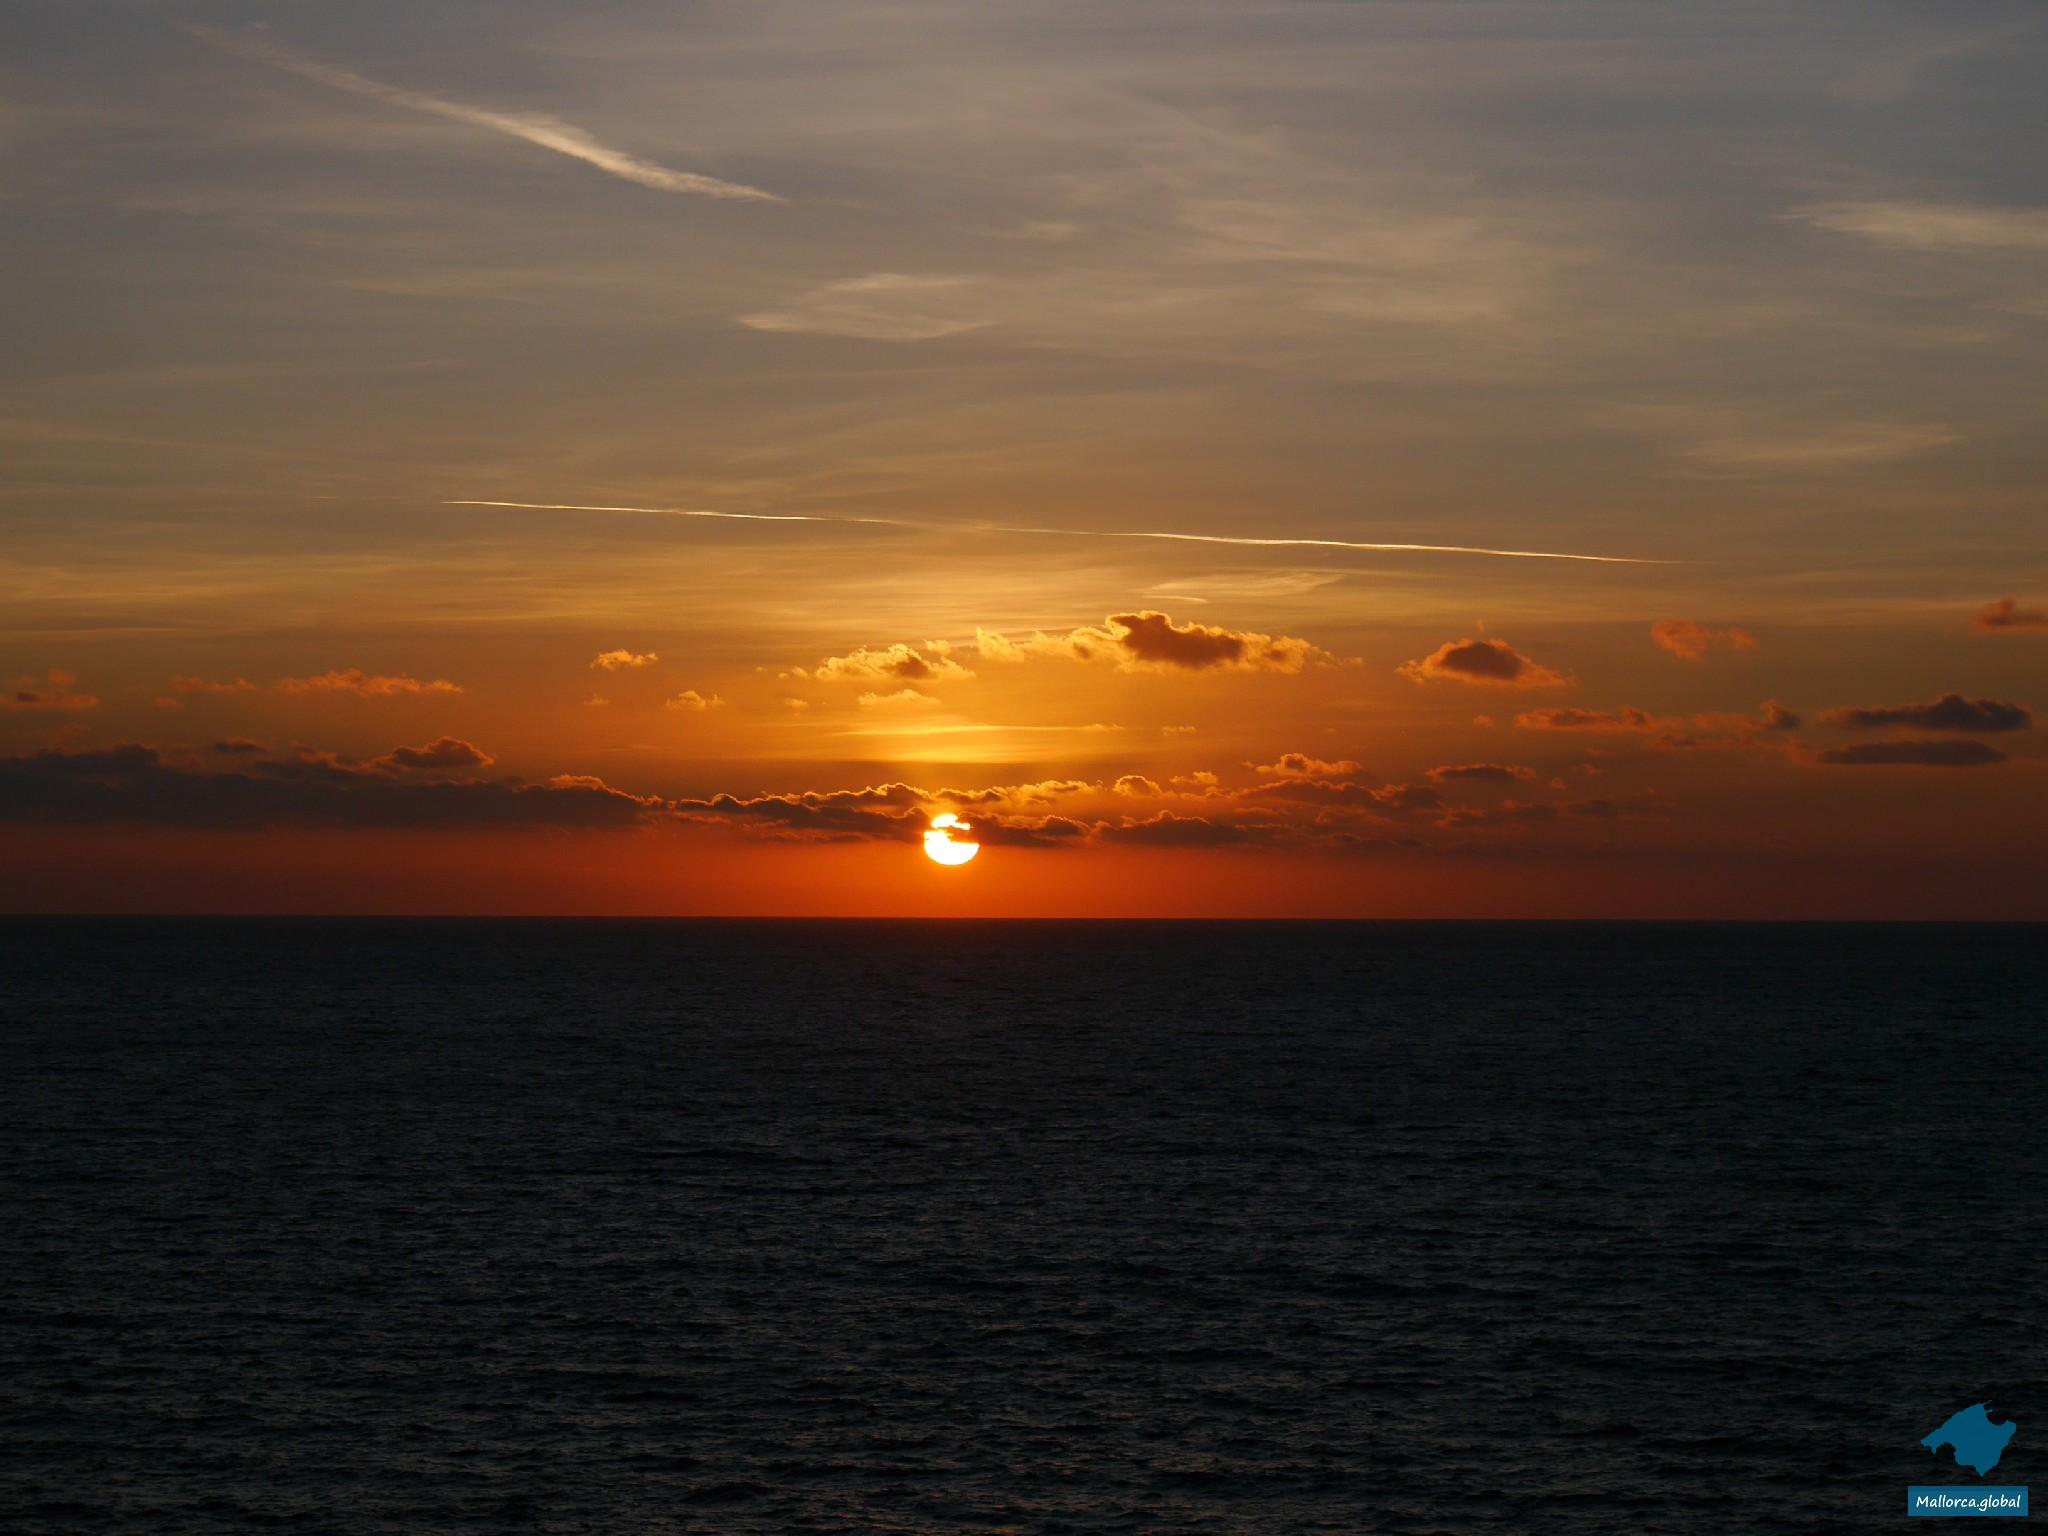 Sonnenuntergang über dem Meer vor Mallorca